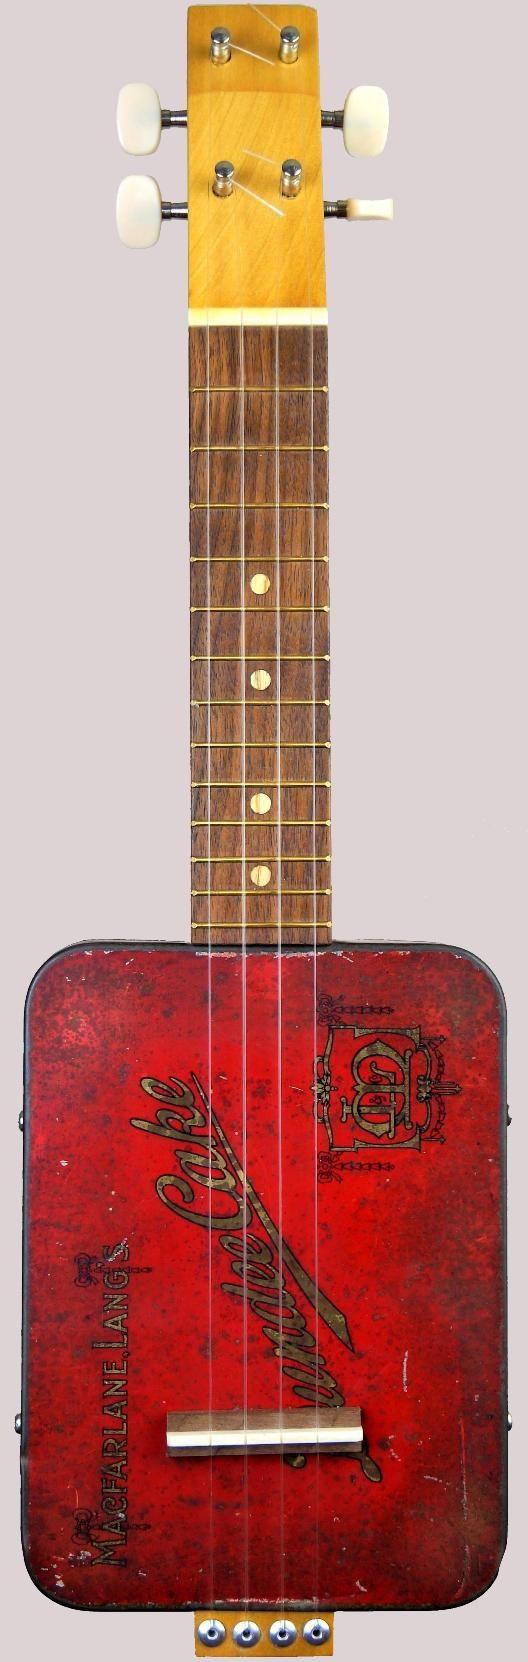 Cig-R Guitars Soprano Canjolele